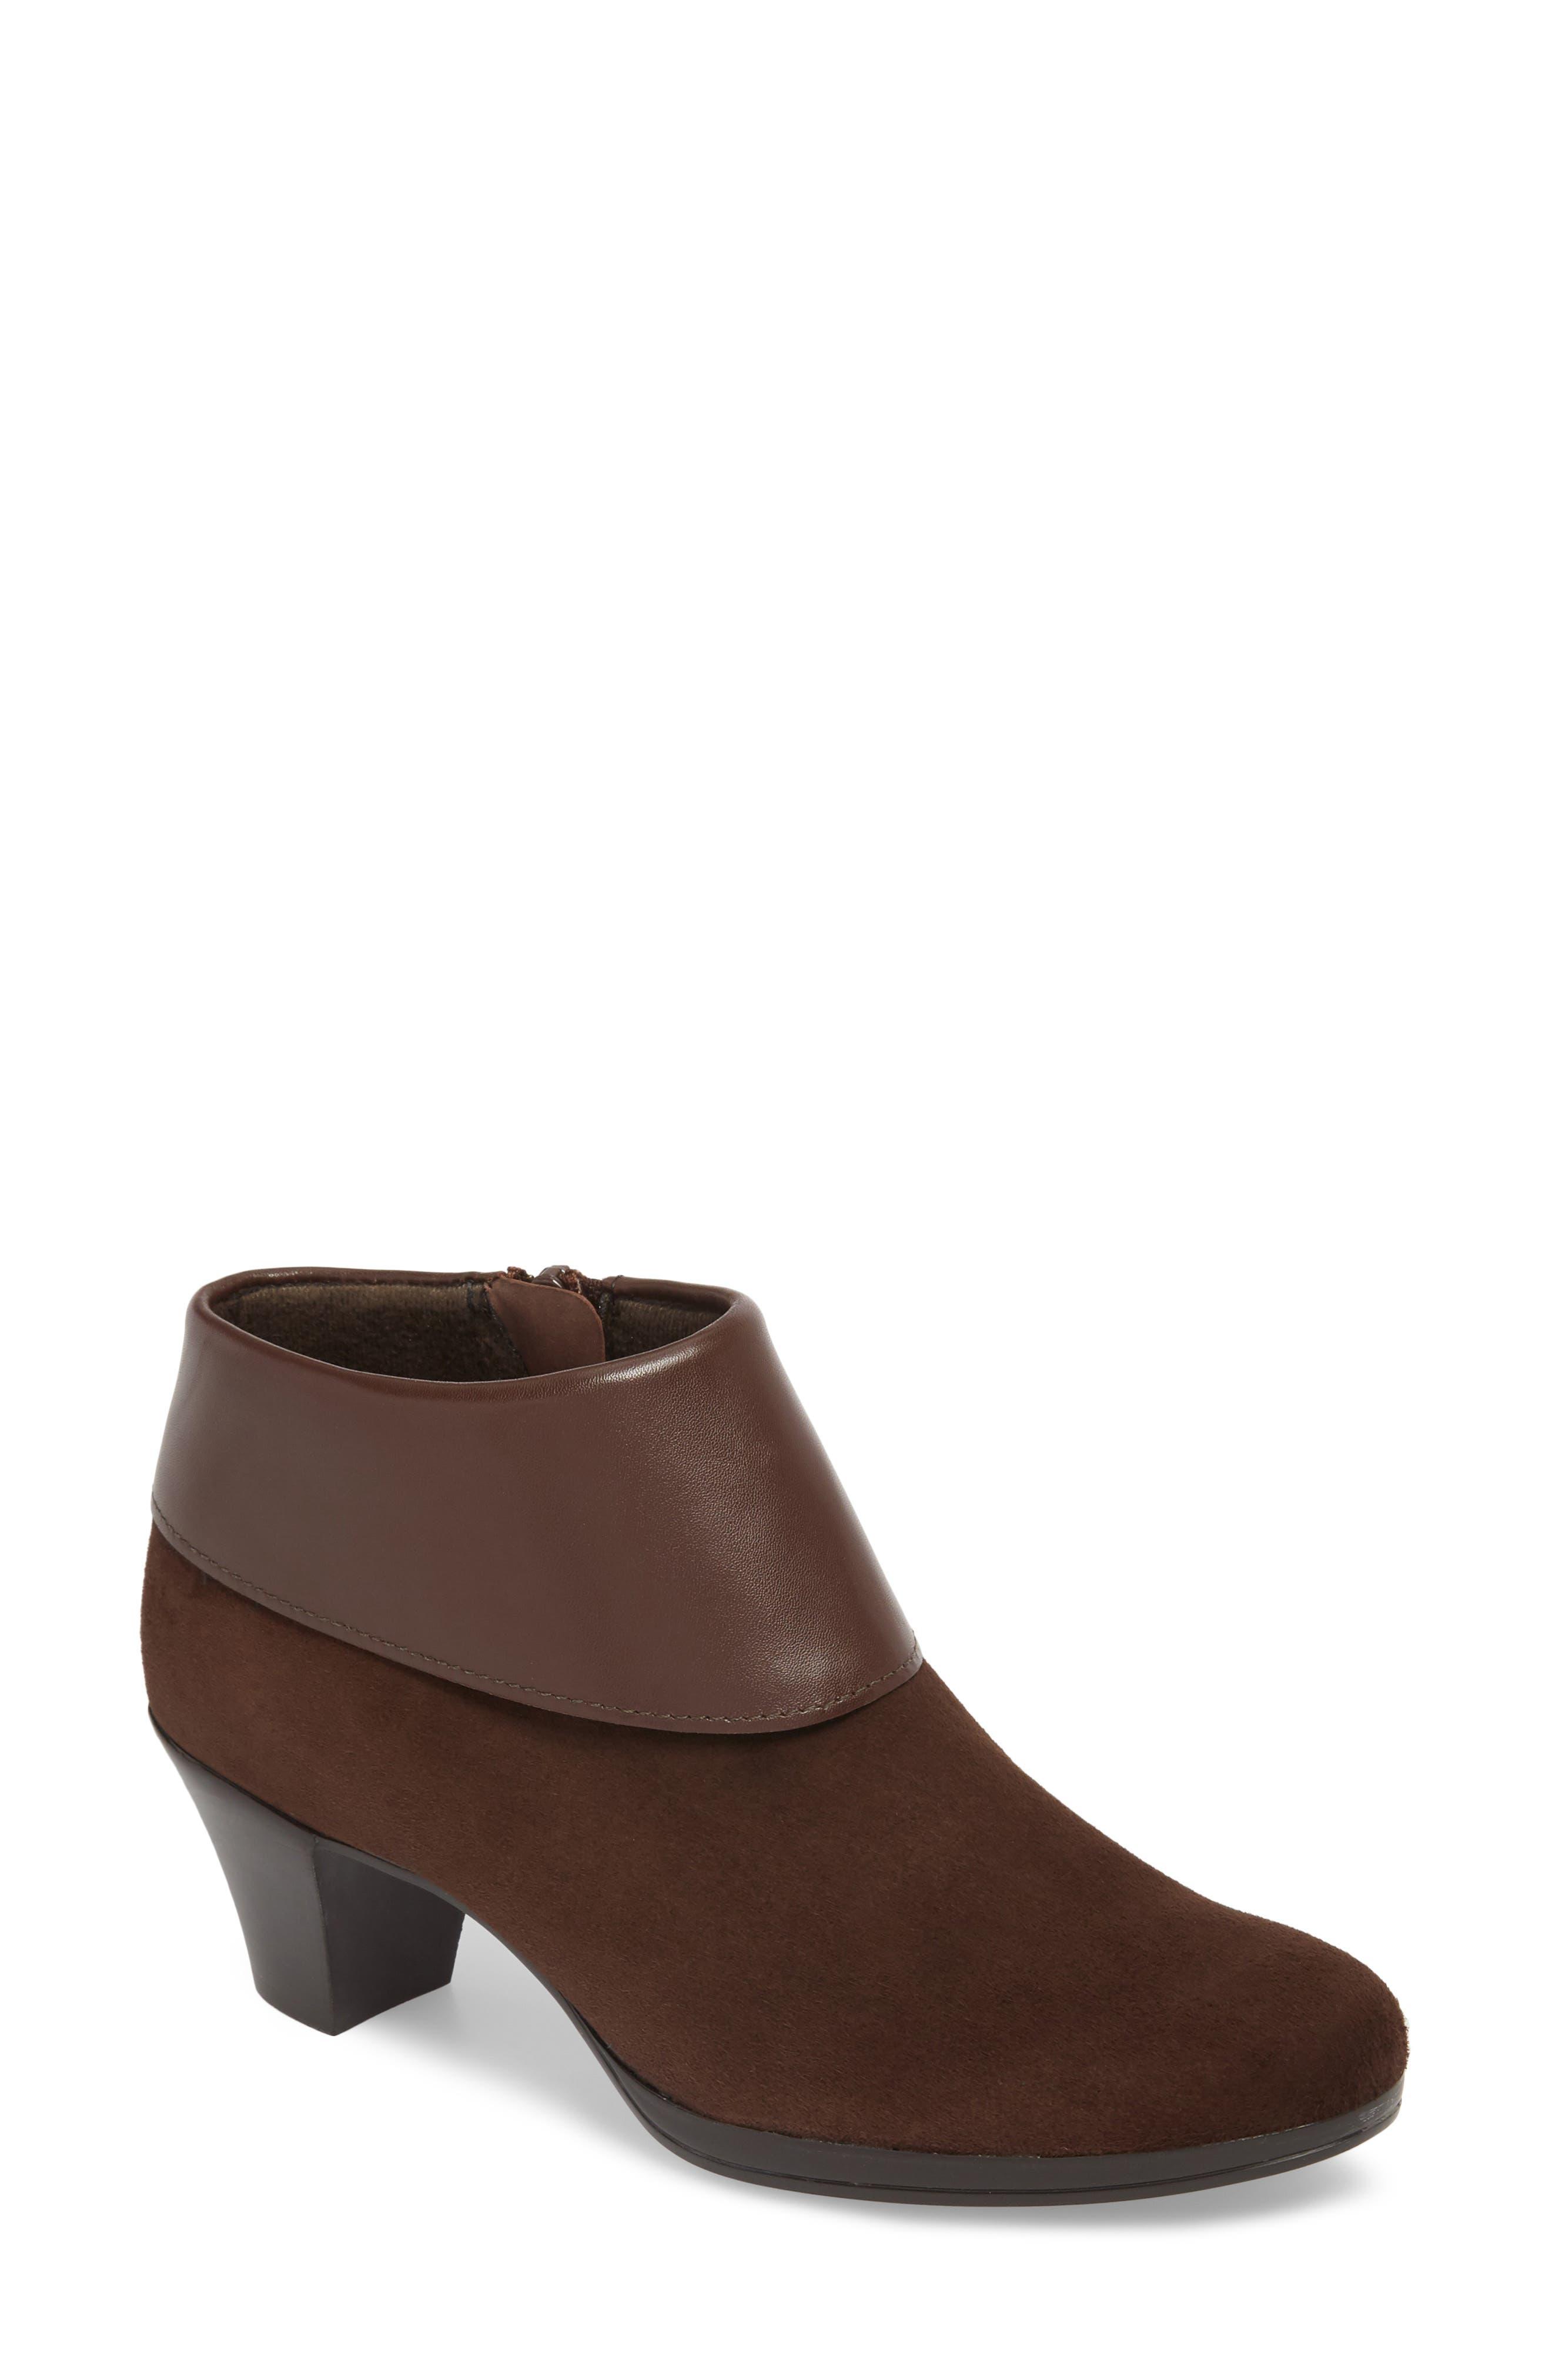 Munro Gracee Boot, Brown